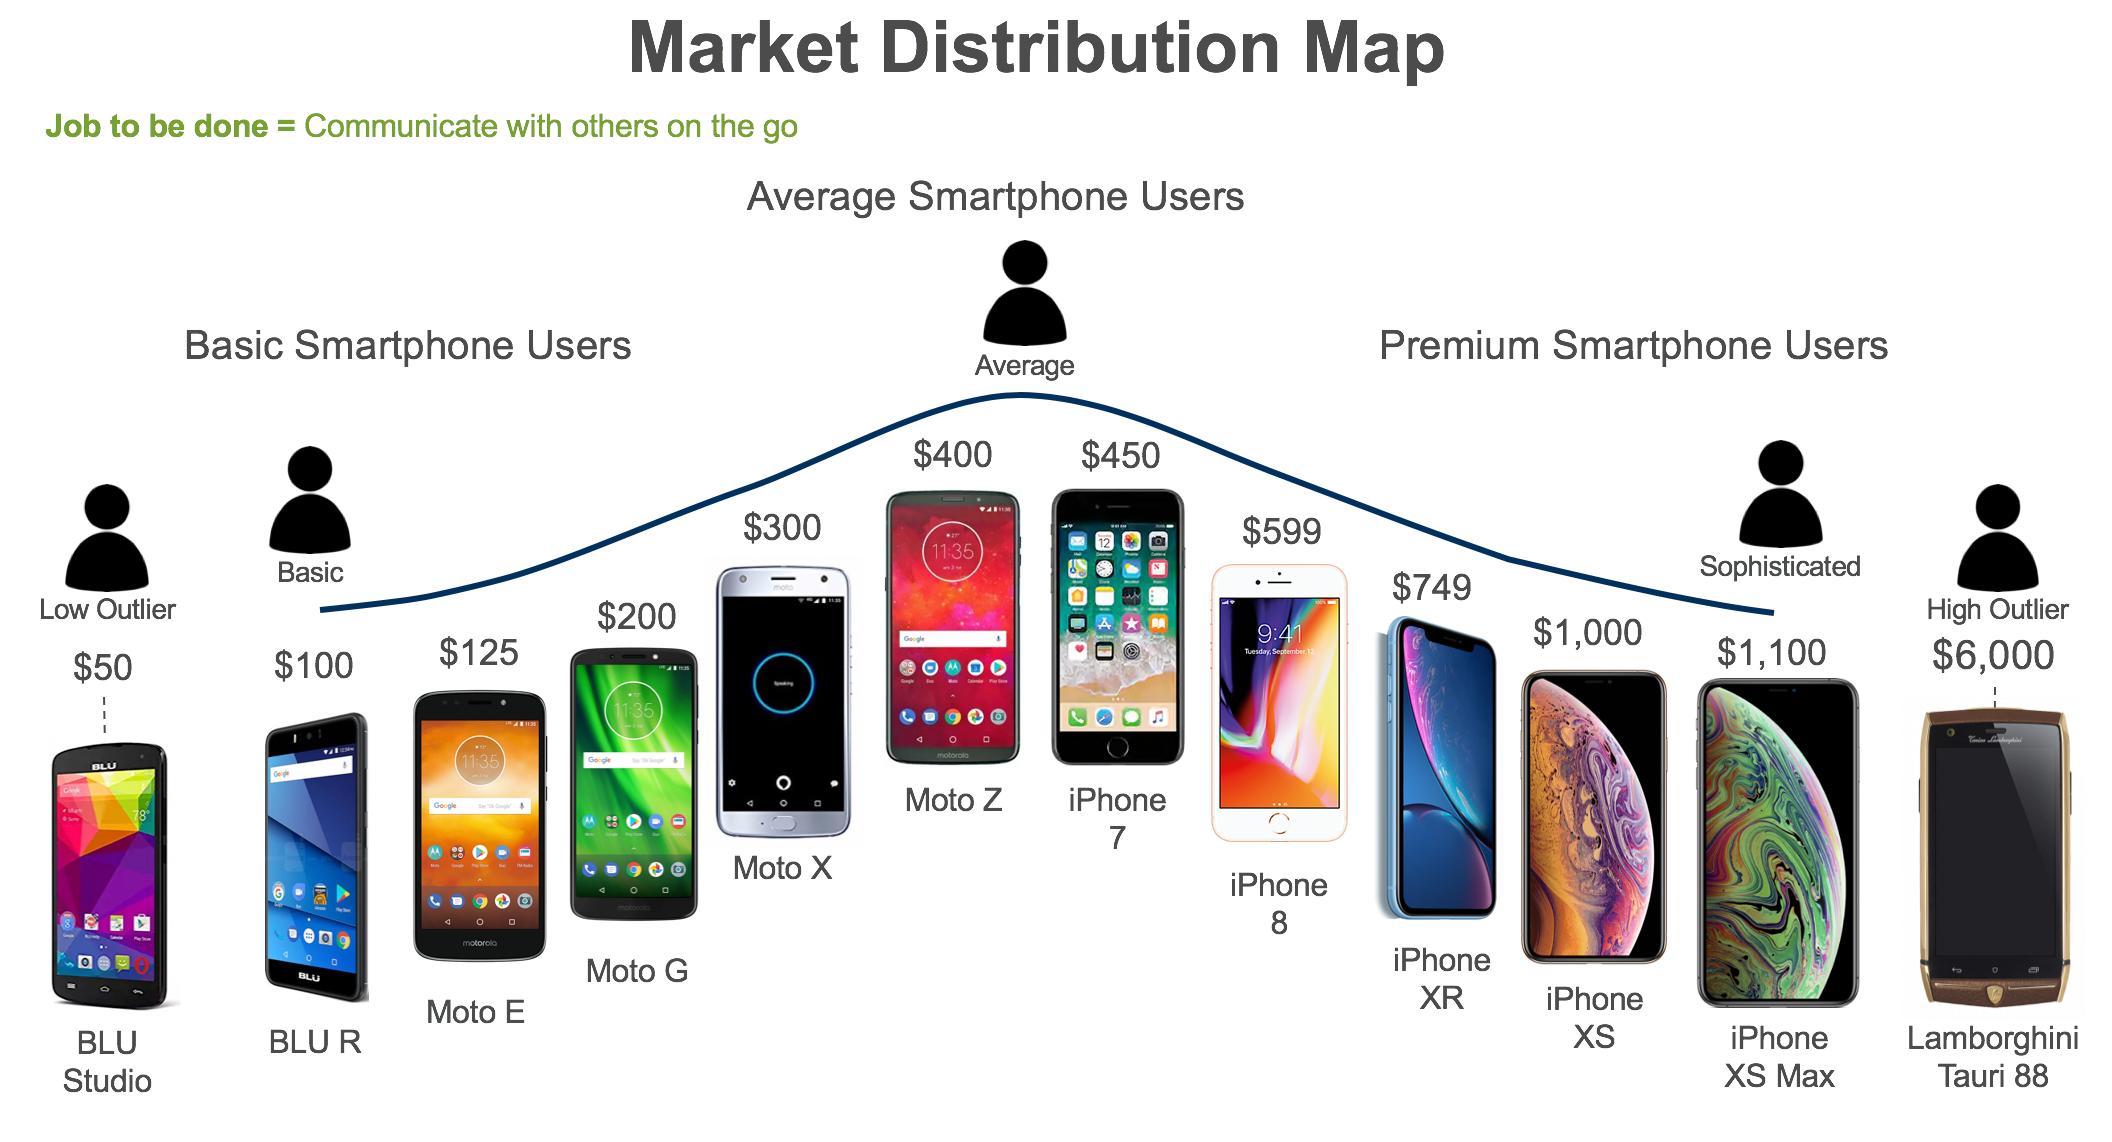 Smartphone market map